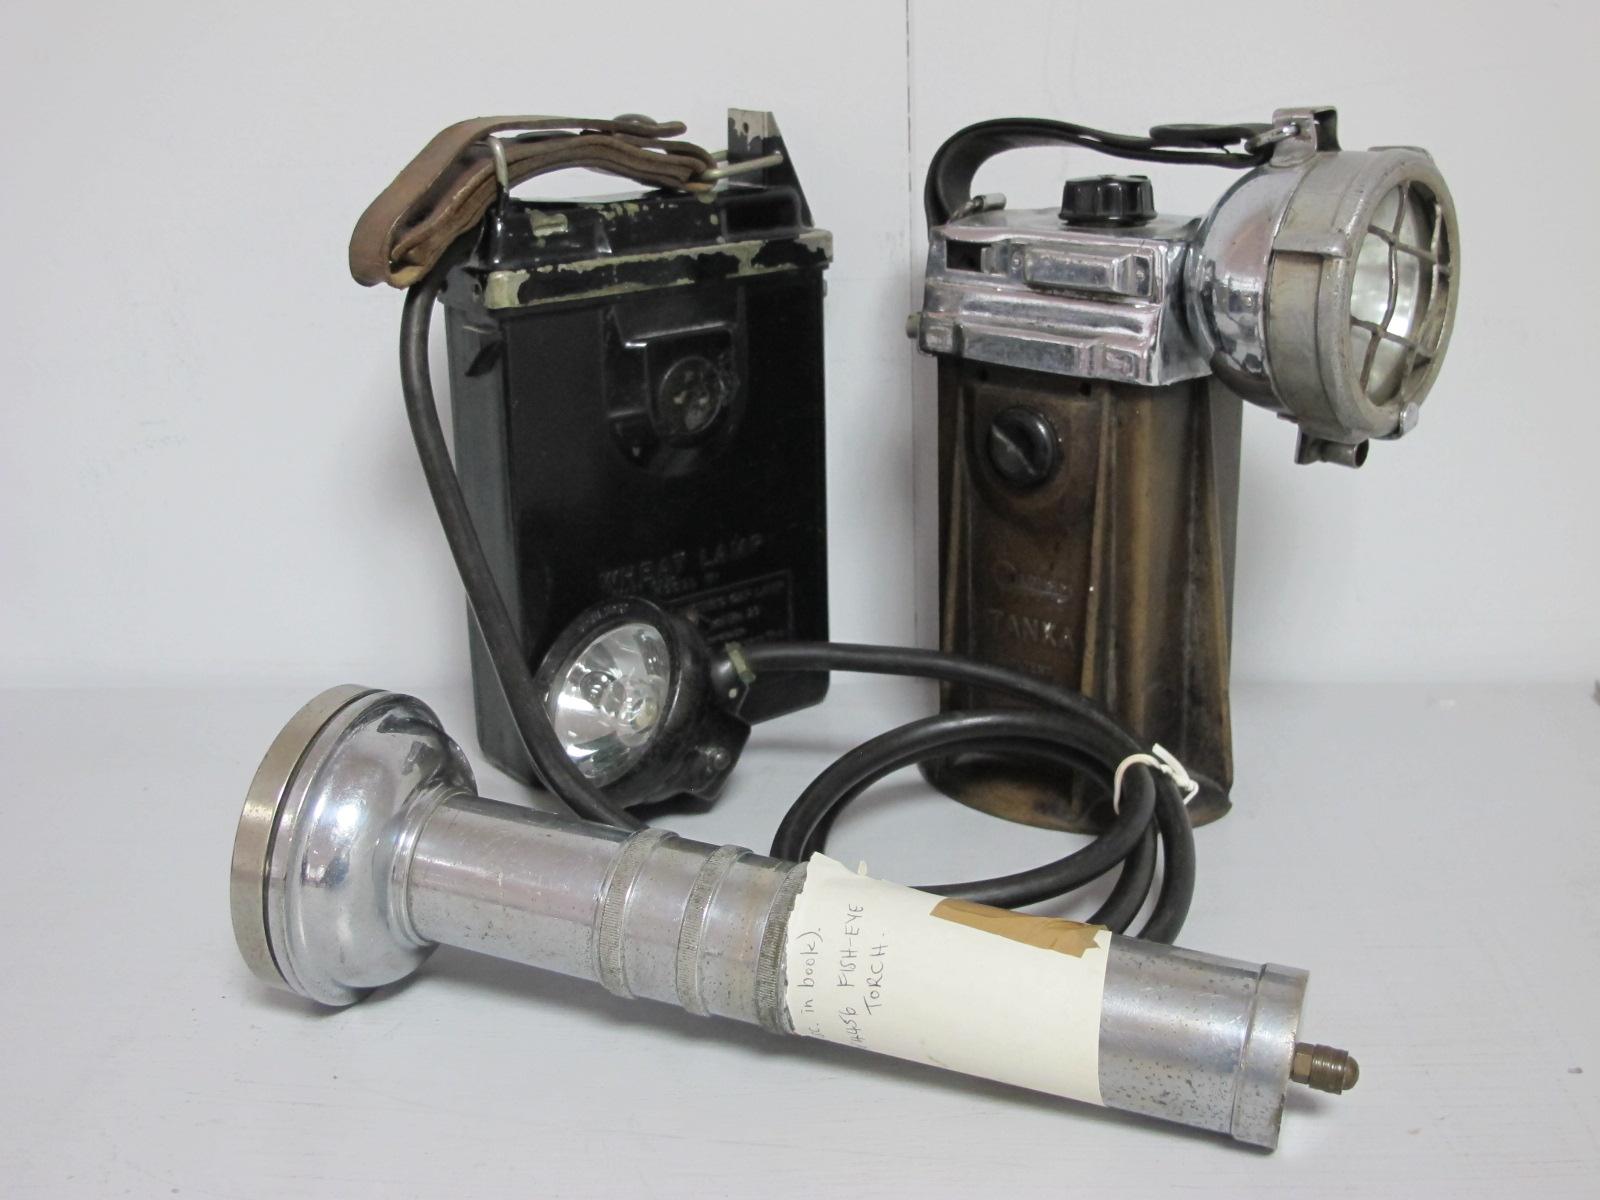 Oldham of Denton 'Tanka' Lamp No. 25, circa 1946, CEAG Fisheye Torch AP4456, Koehler Wheat Lamp